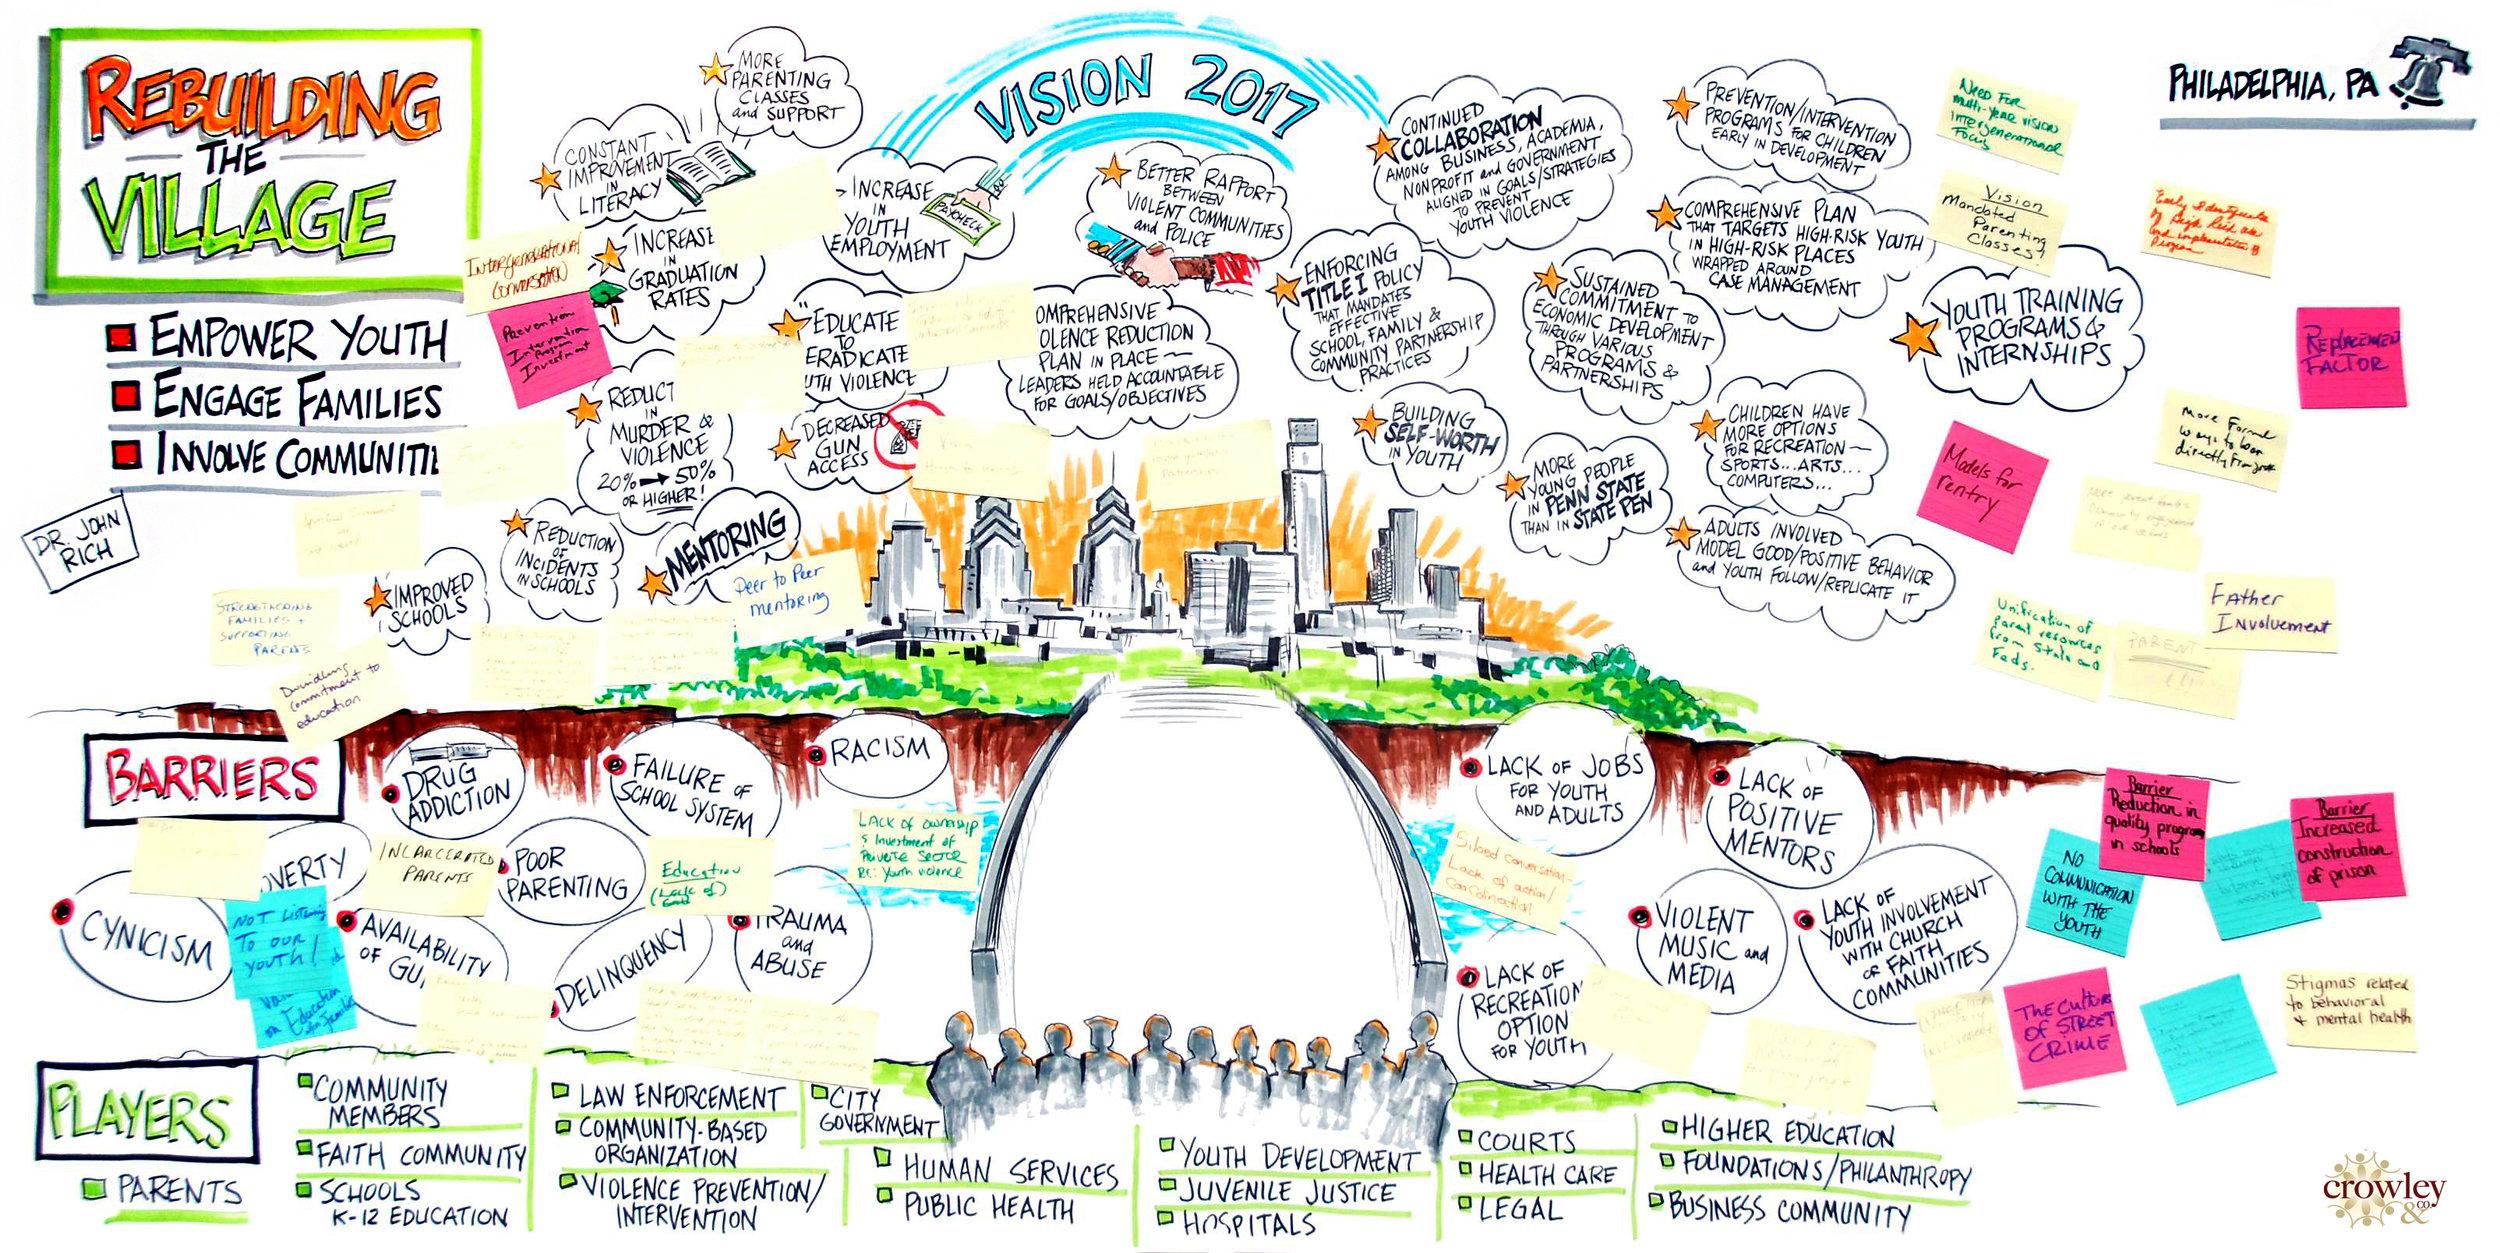 6 - Rebuilding the Village - Philadelphia Vision with participant comments.jpg